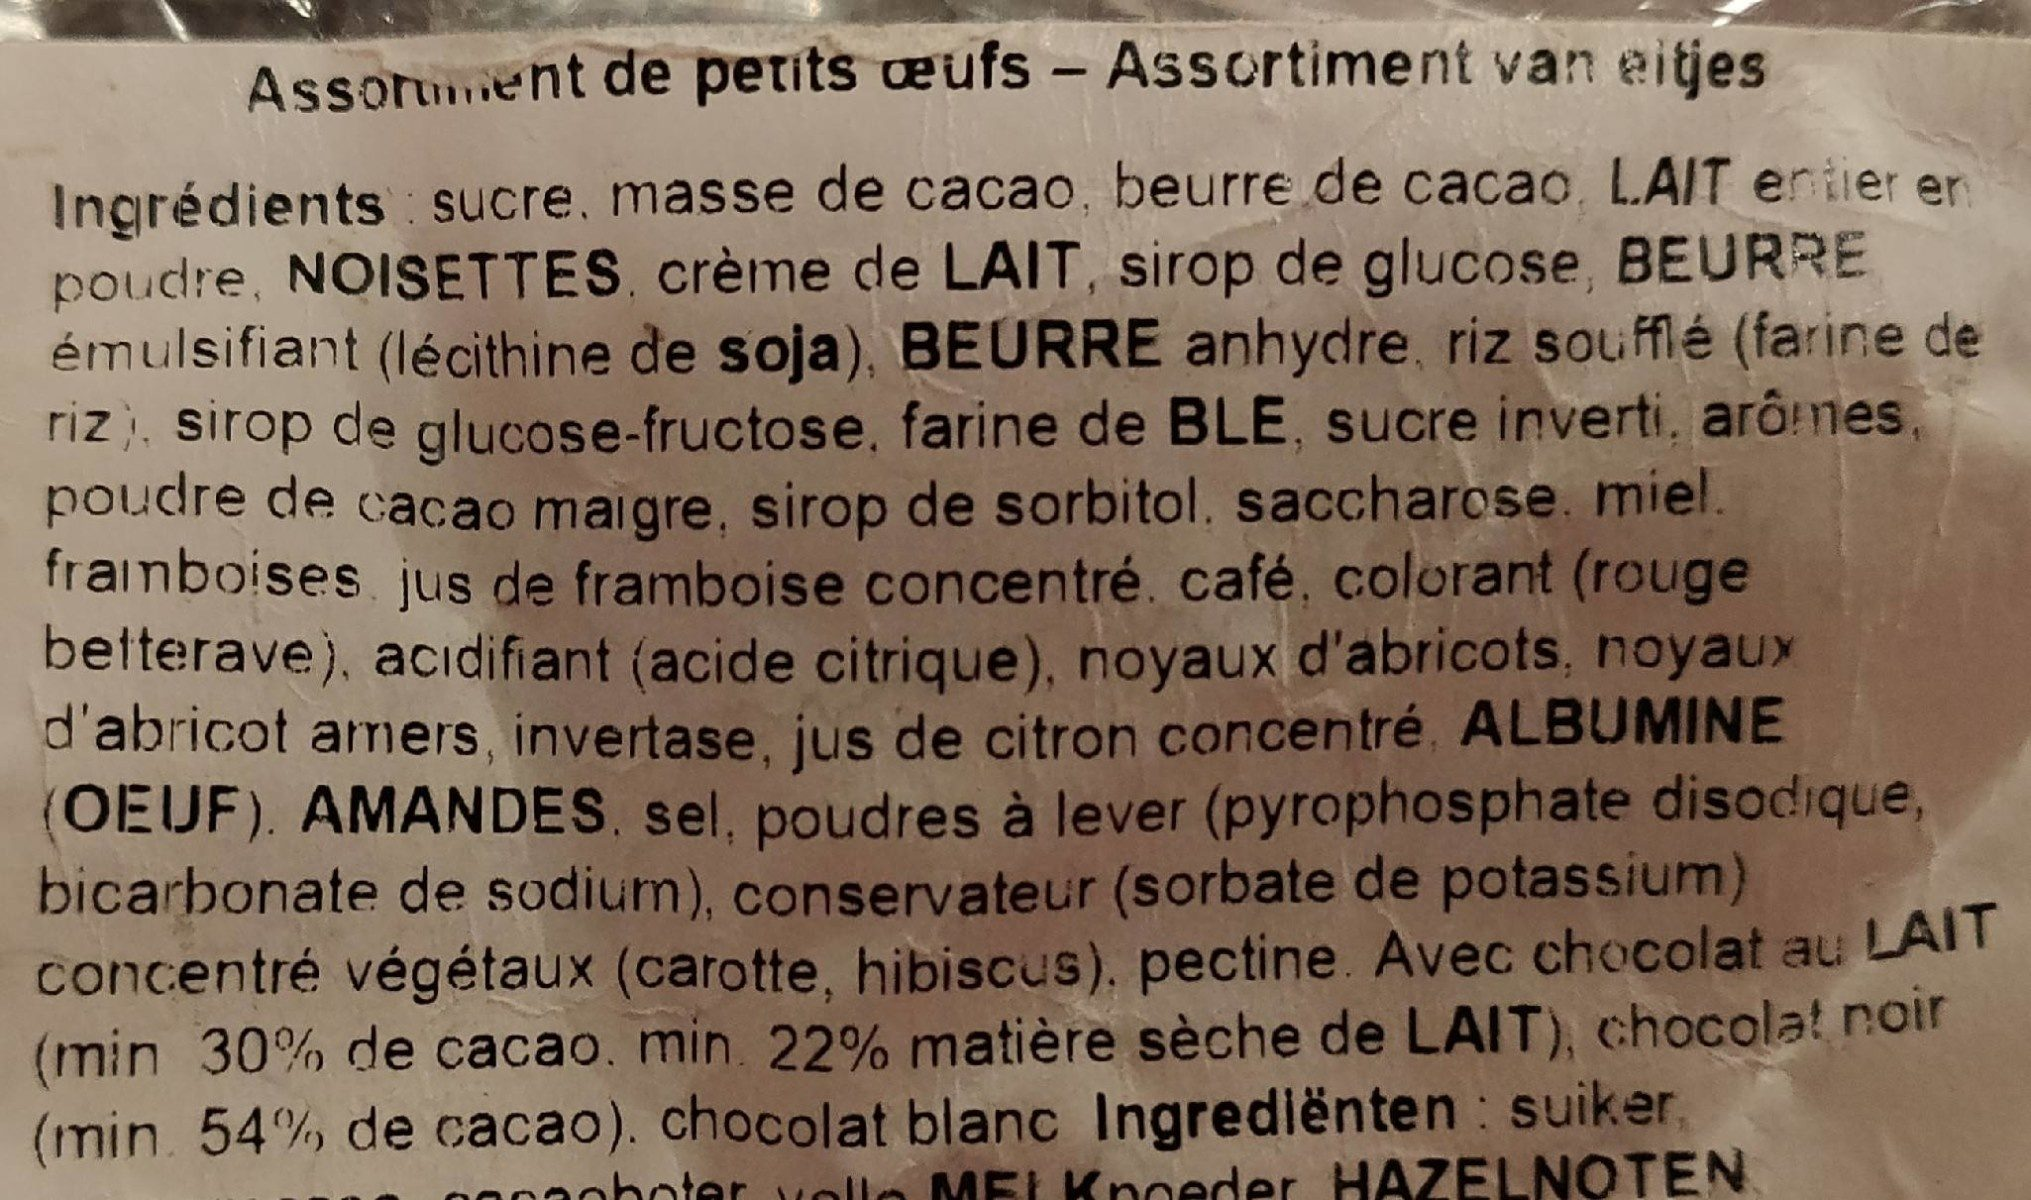 Maître chocolatier - Ingrédients